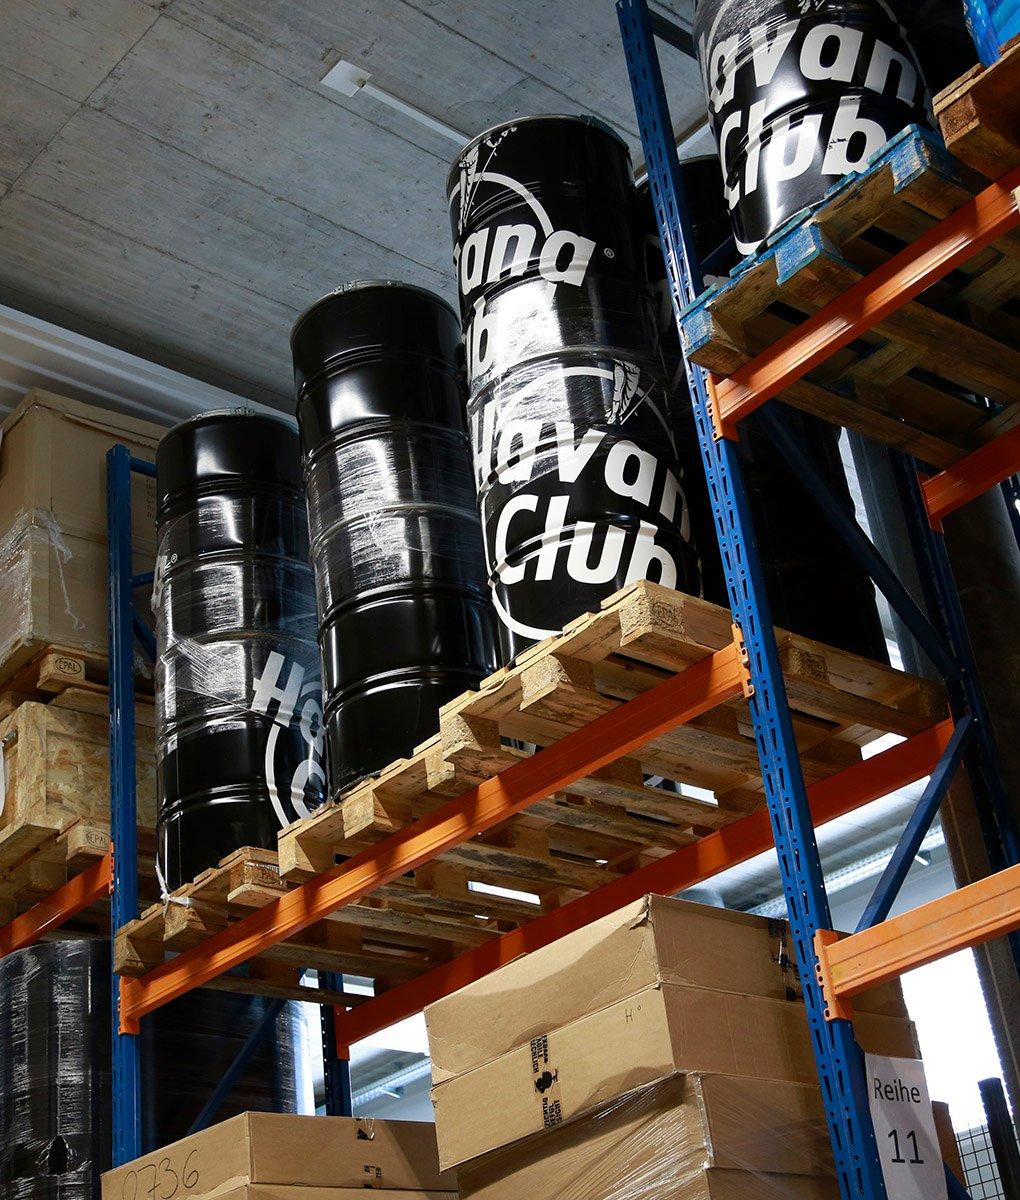 promotion-tools_logistik_pernod_ricard_havana_club_hochlager_66B0717_2_1